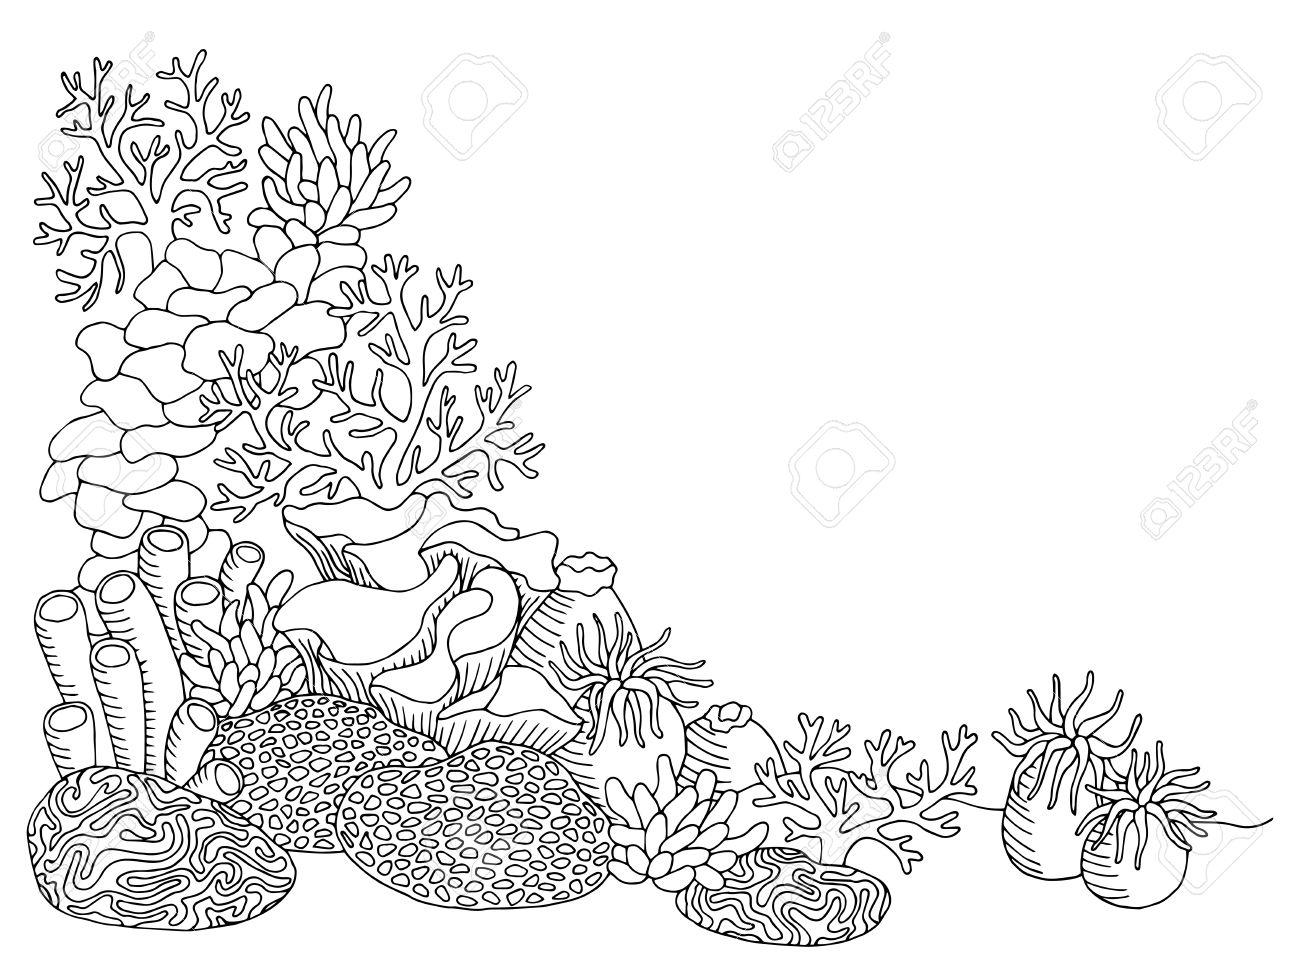 Coral sea graphic art black white underwater landscape illustration...